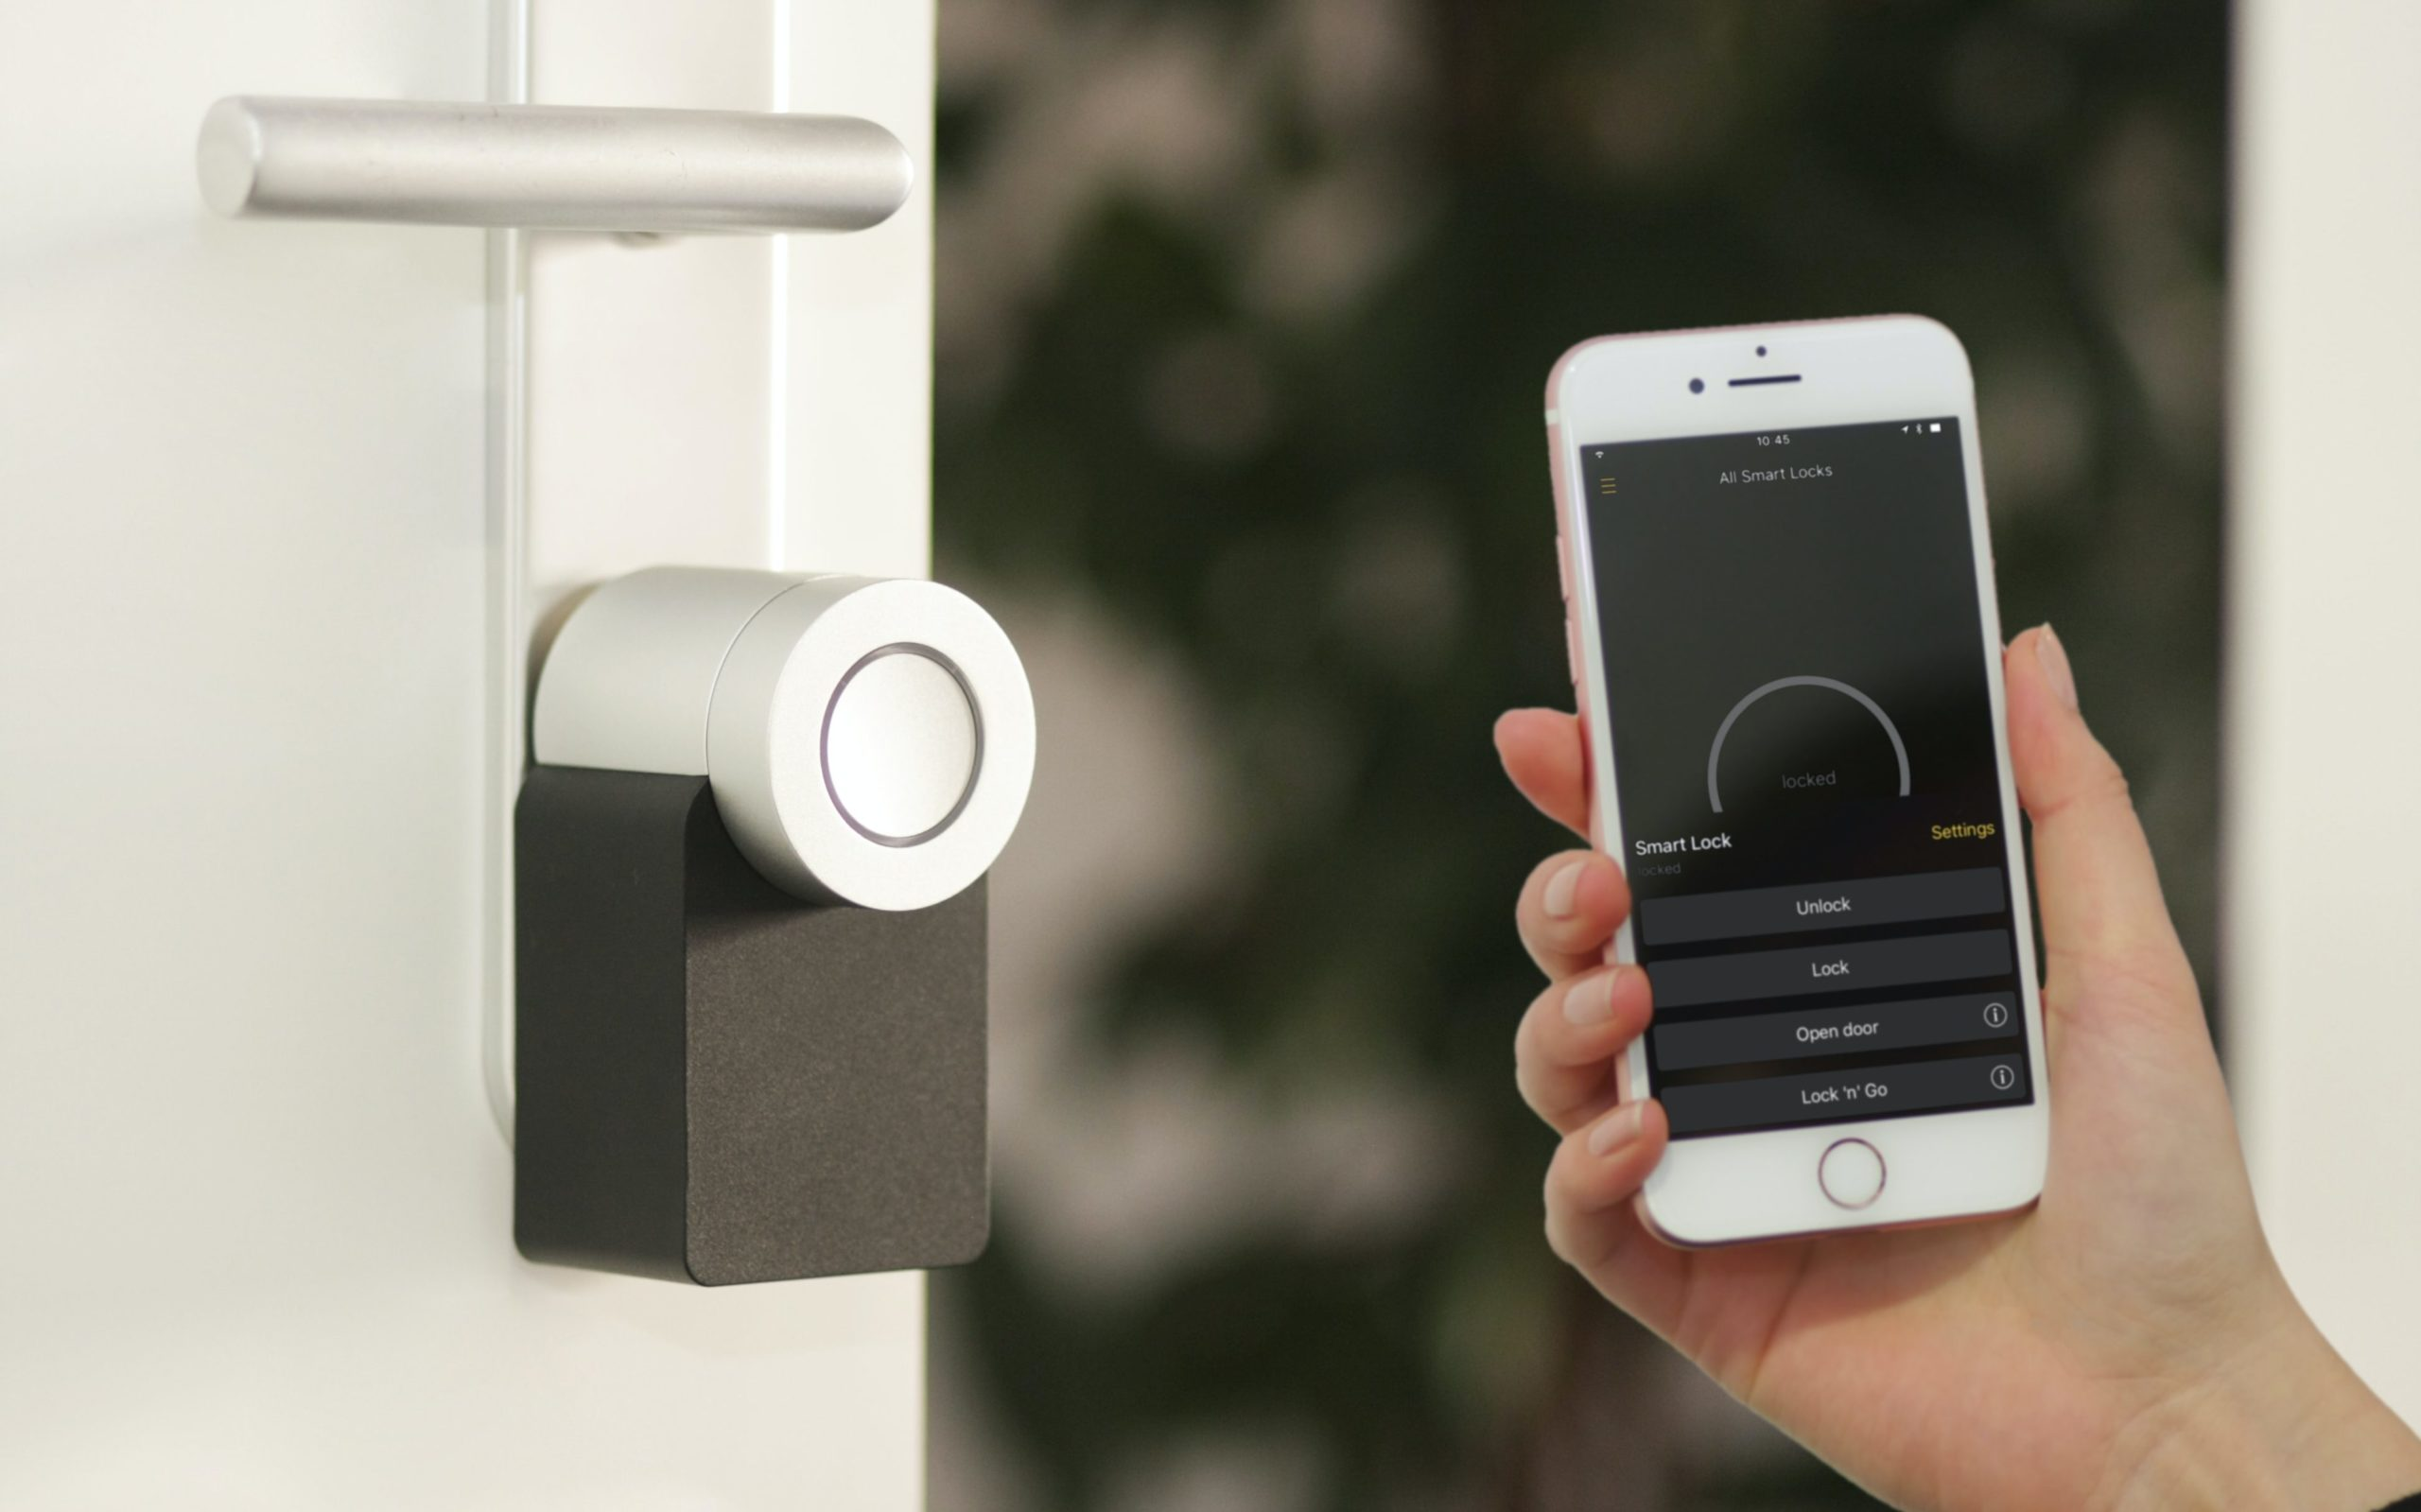 an iphone unlocking a home's front door using the smart lock app